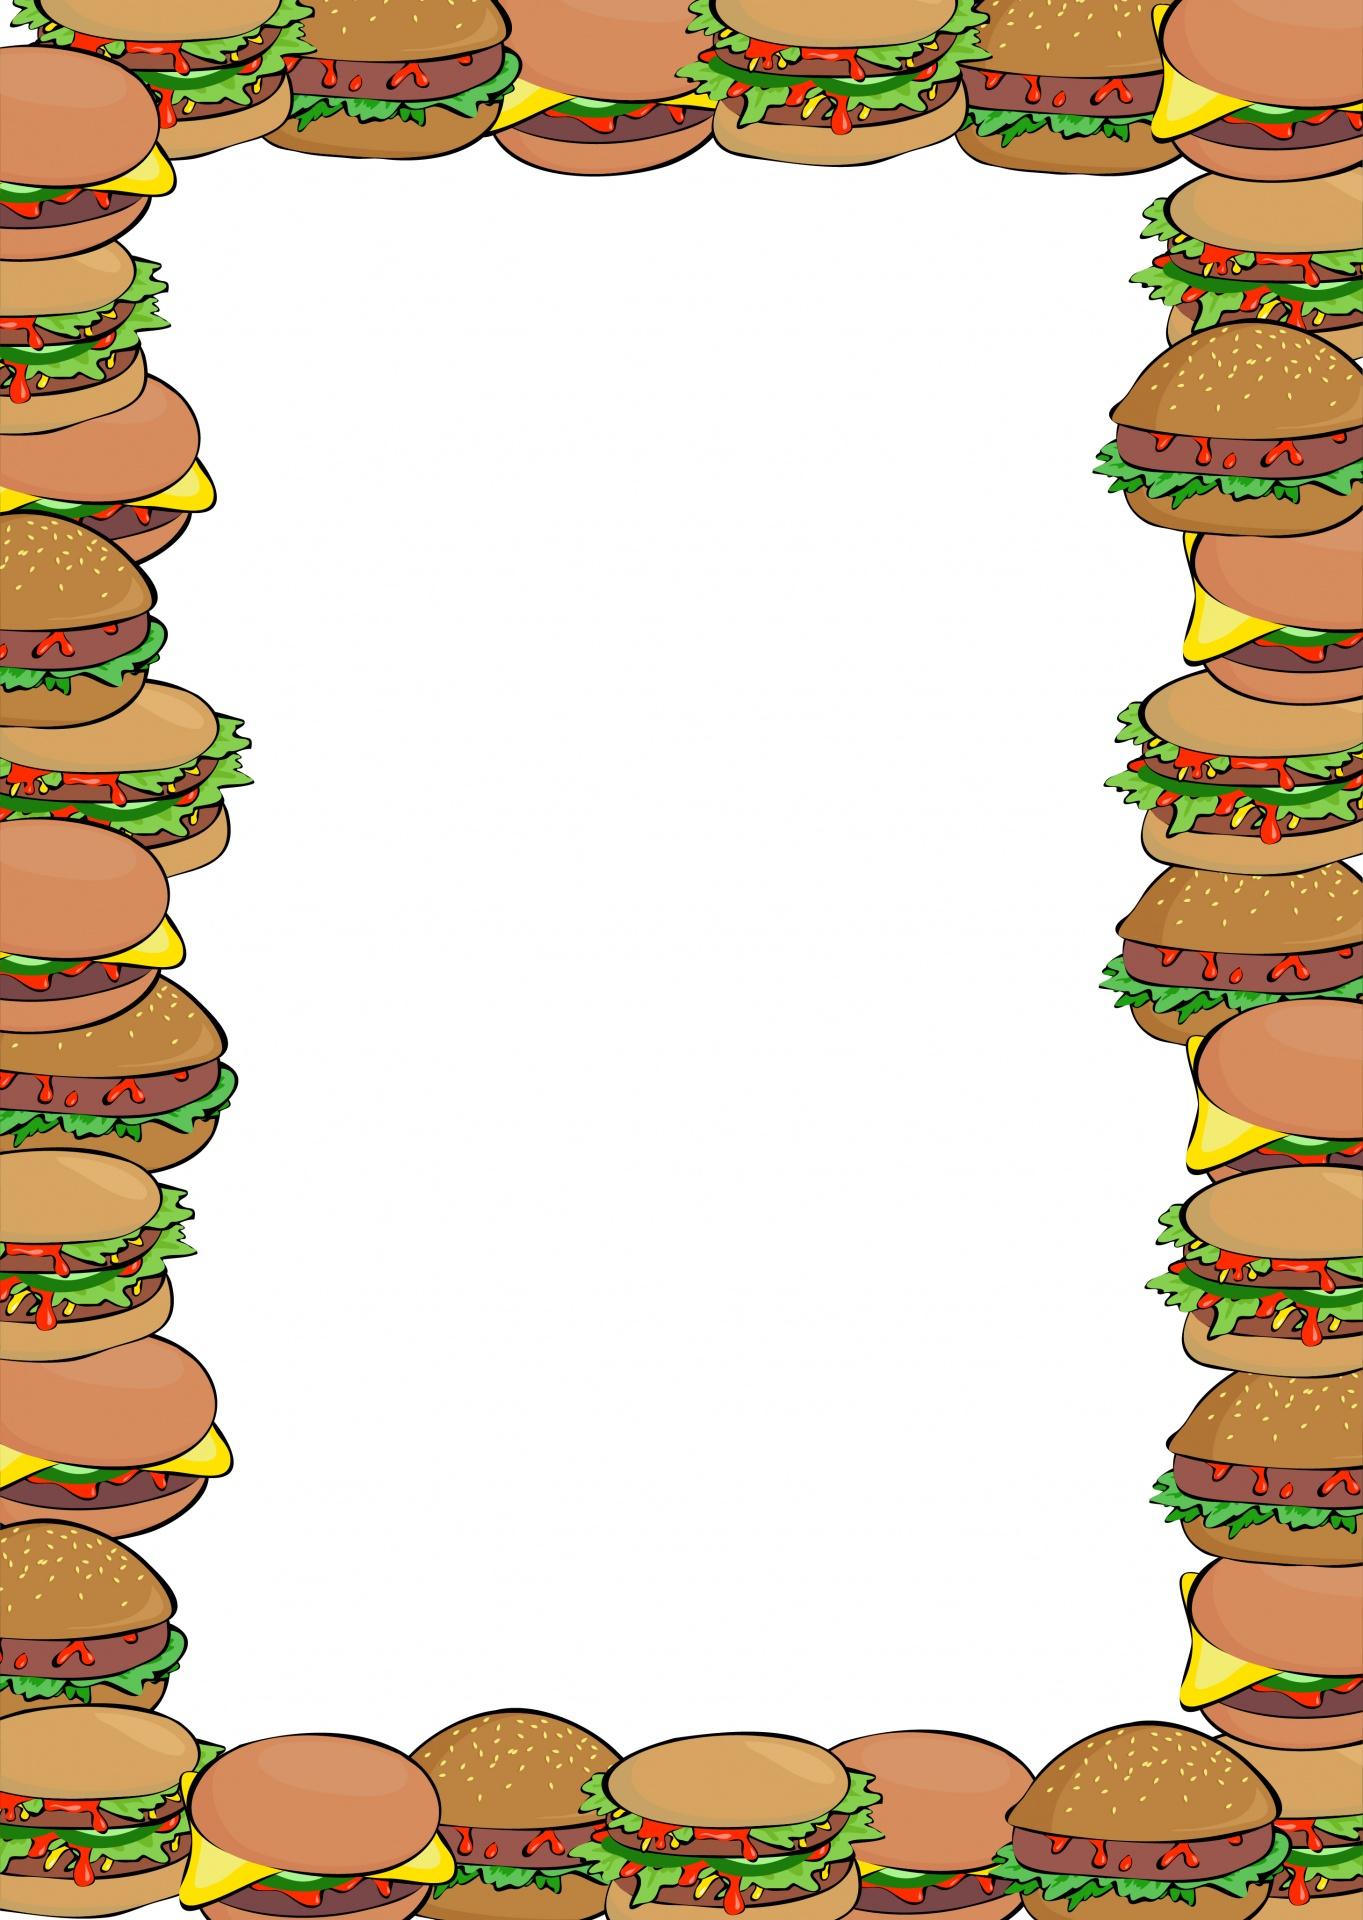 Border free stock photo. Burger clipart frame